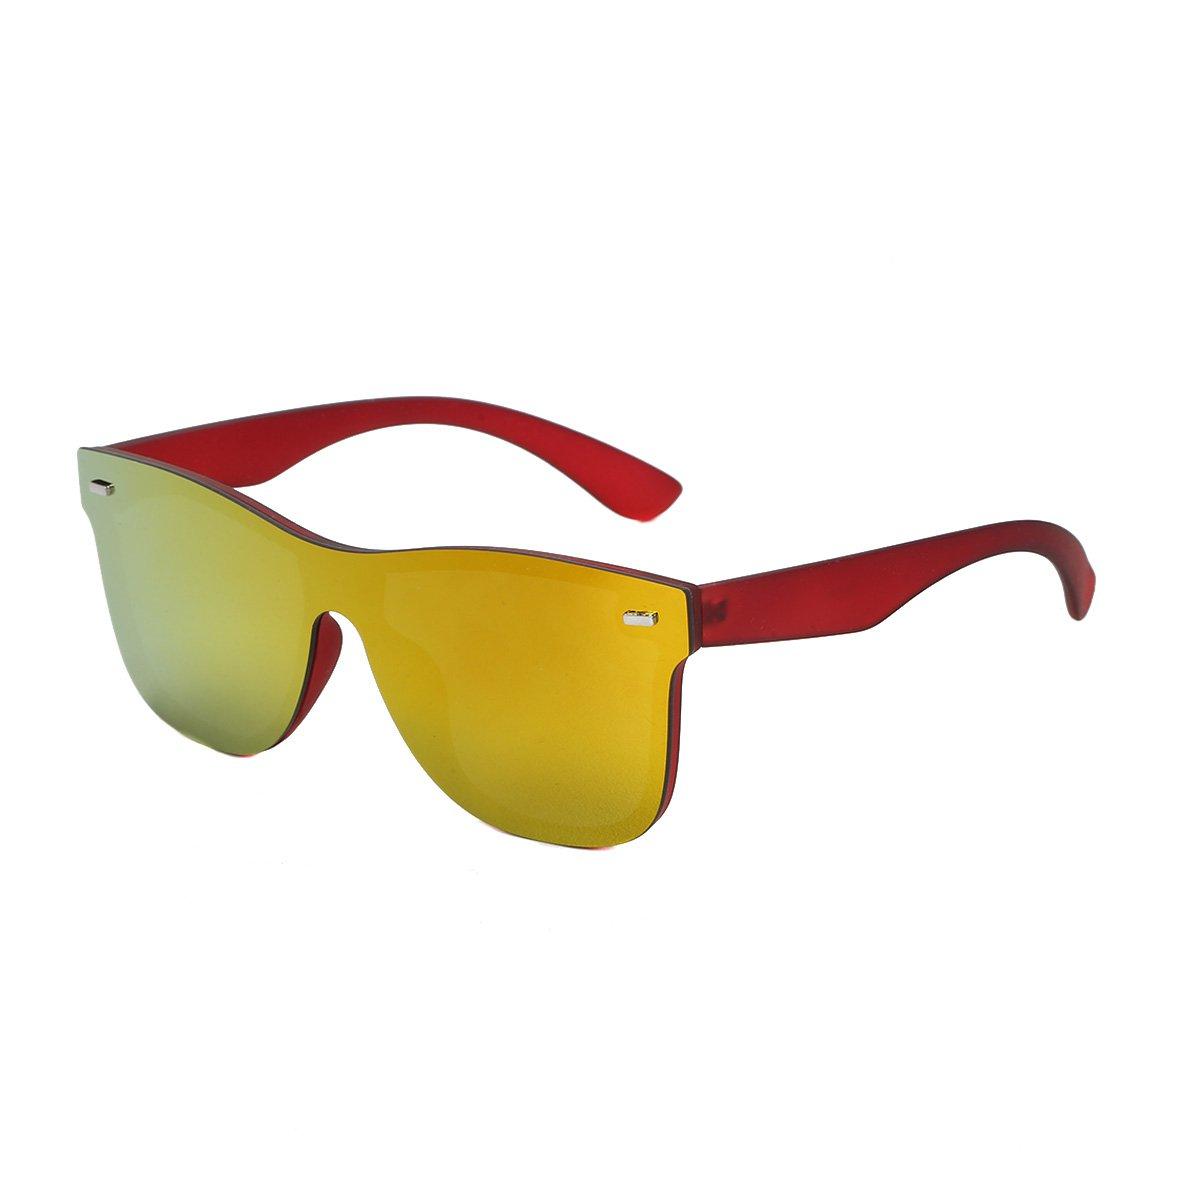 0accebd7d5c34 FornecedorNetshoes. Óculos de Sol King One A03 Feminino